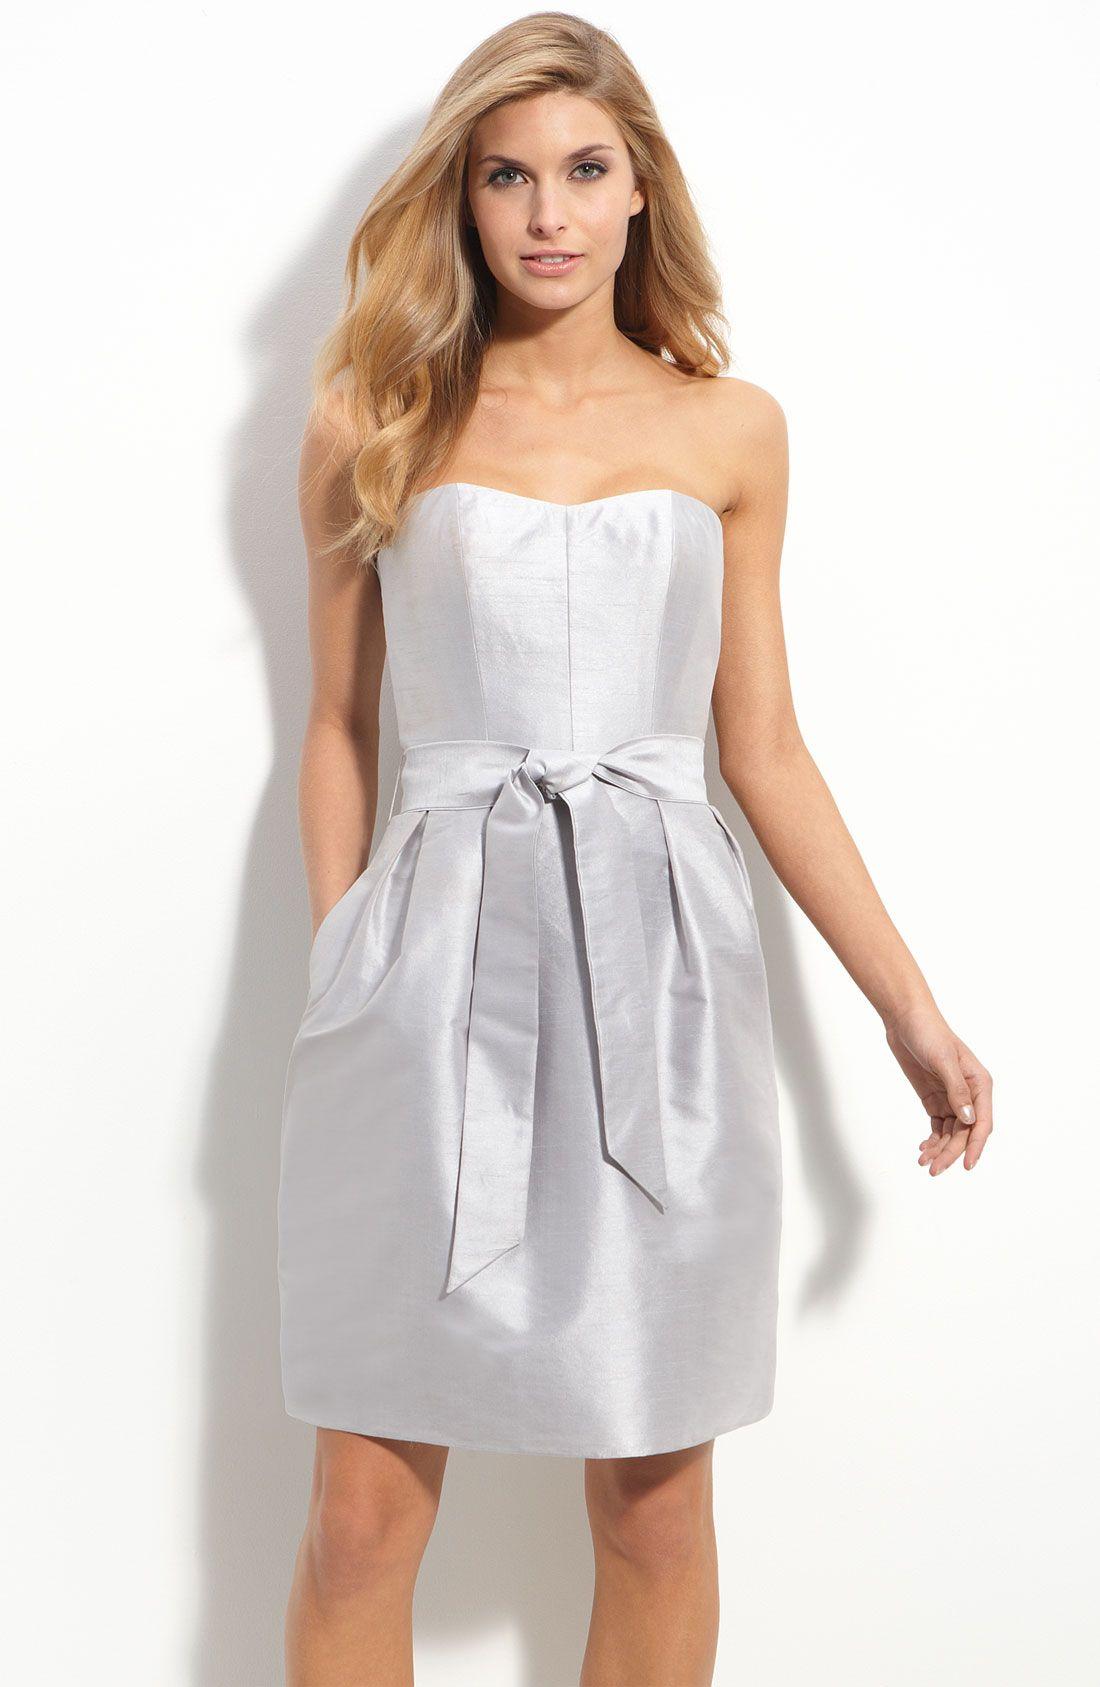 https://www.lyst.co.uk/clothing/js-boutique-strapless-dupioni-dress ...